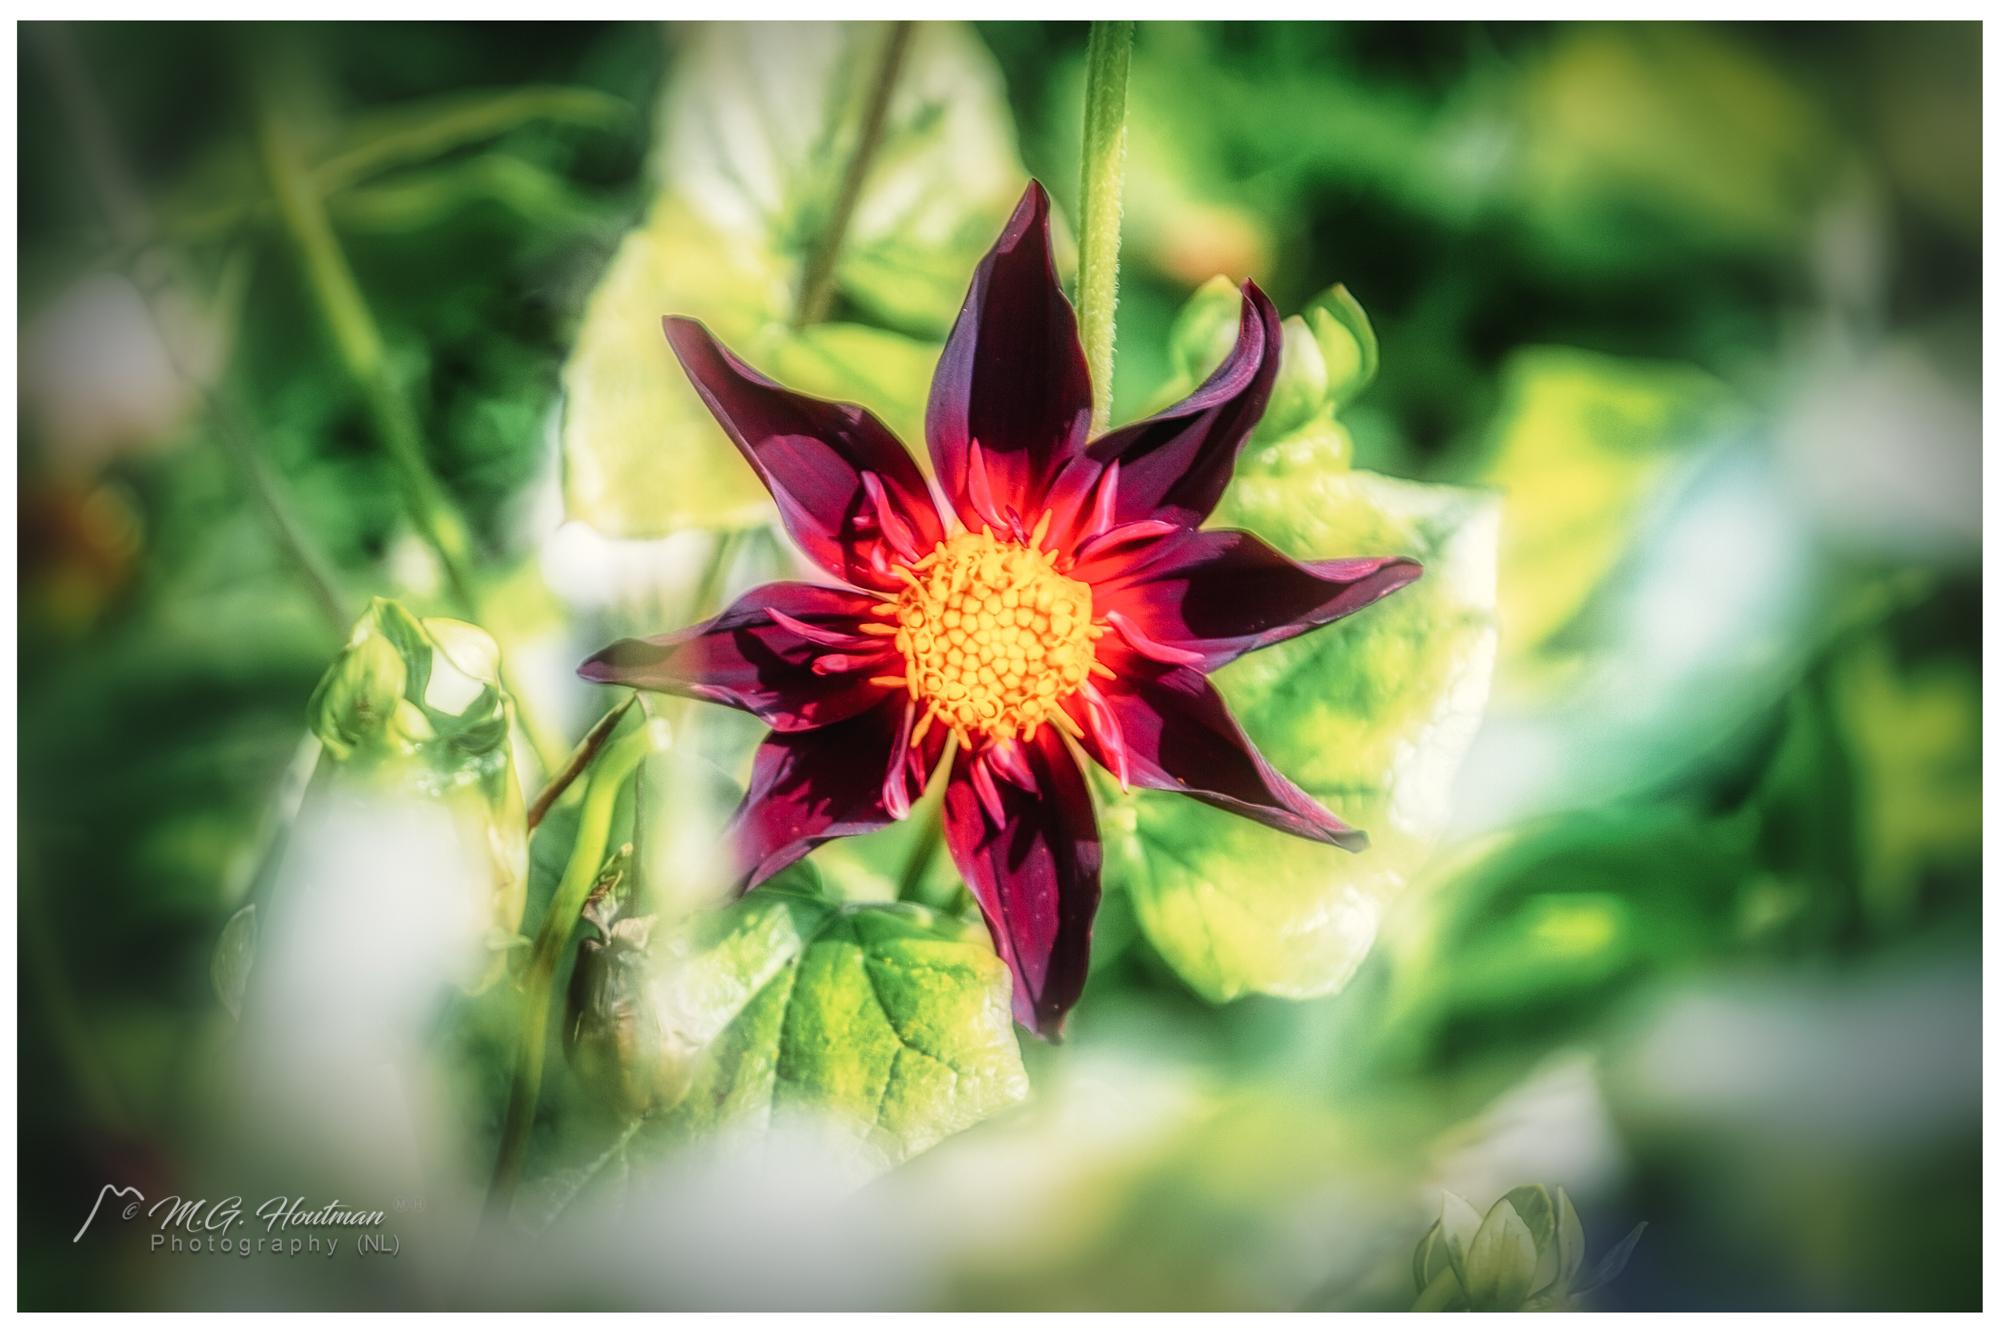 in a botanical garden